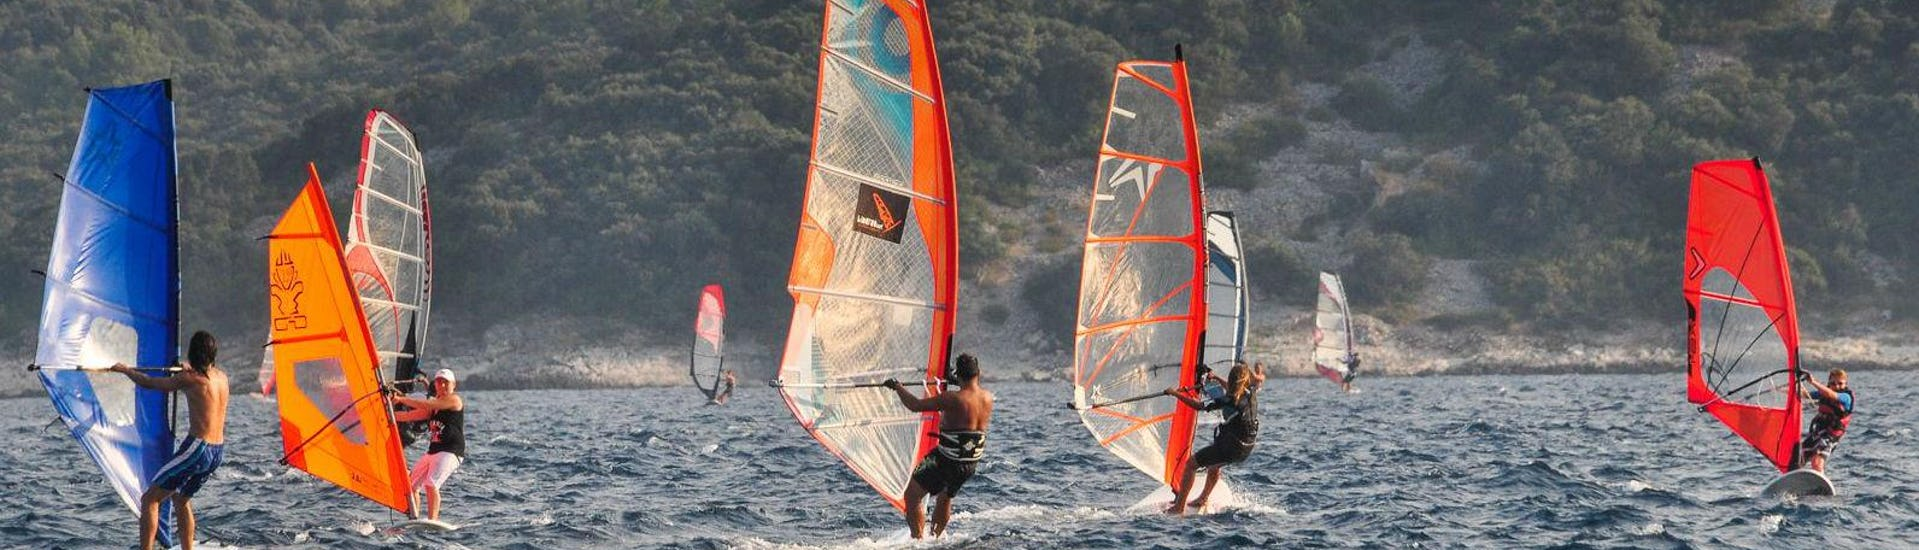 Windsurfing Lessons for Kids & Adults - Beginner